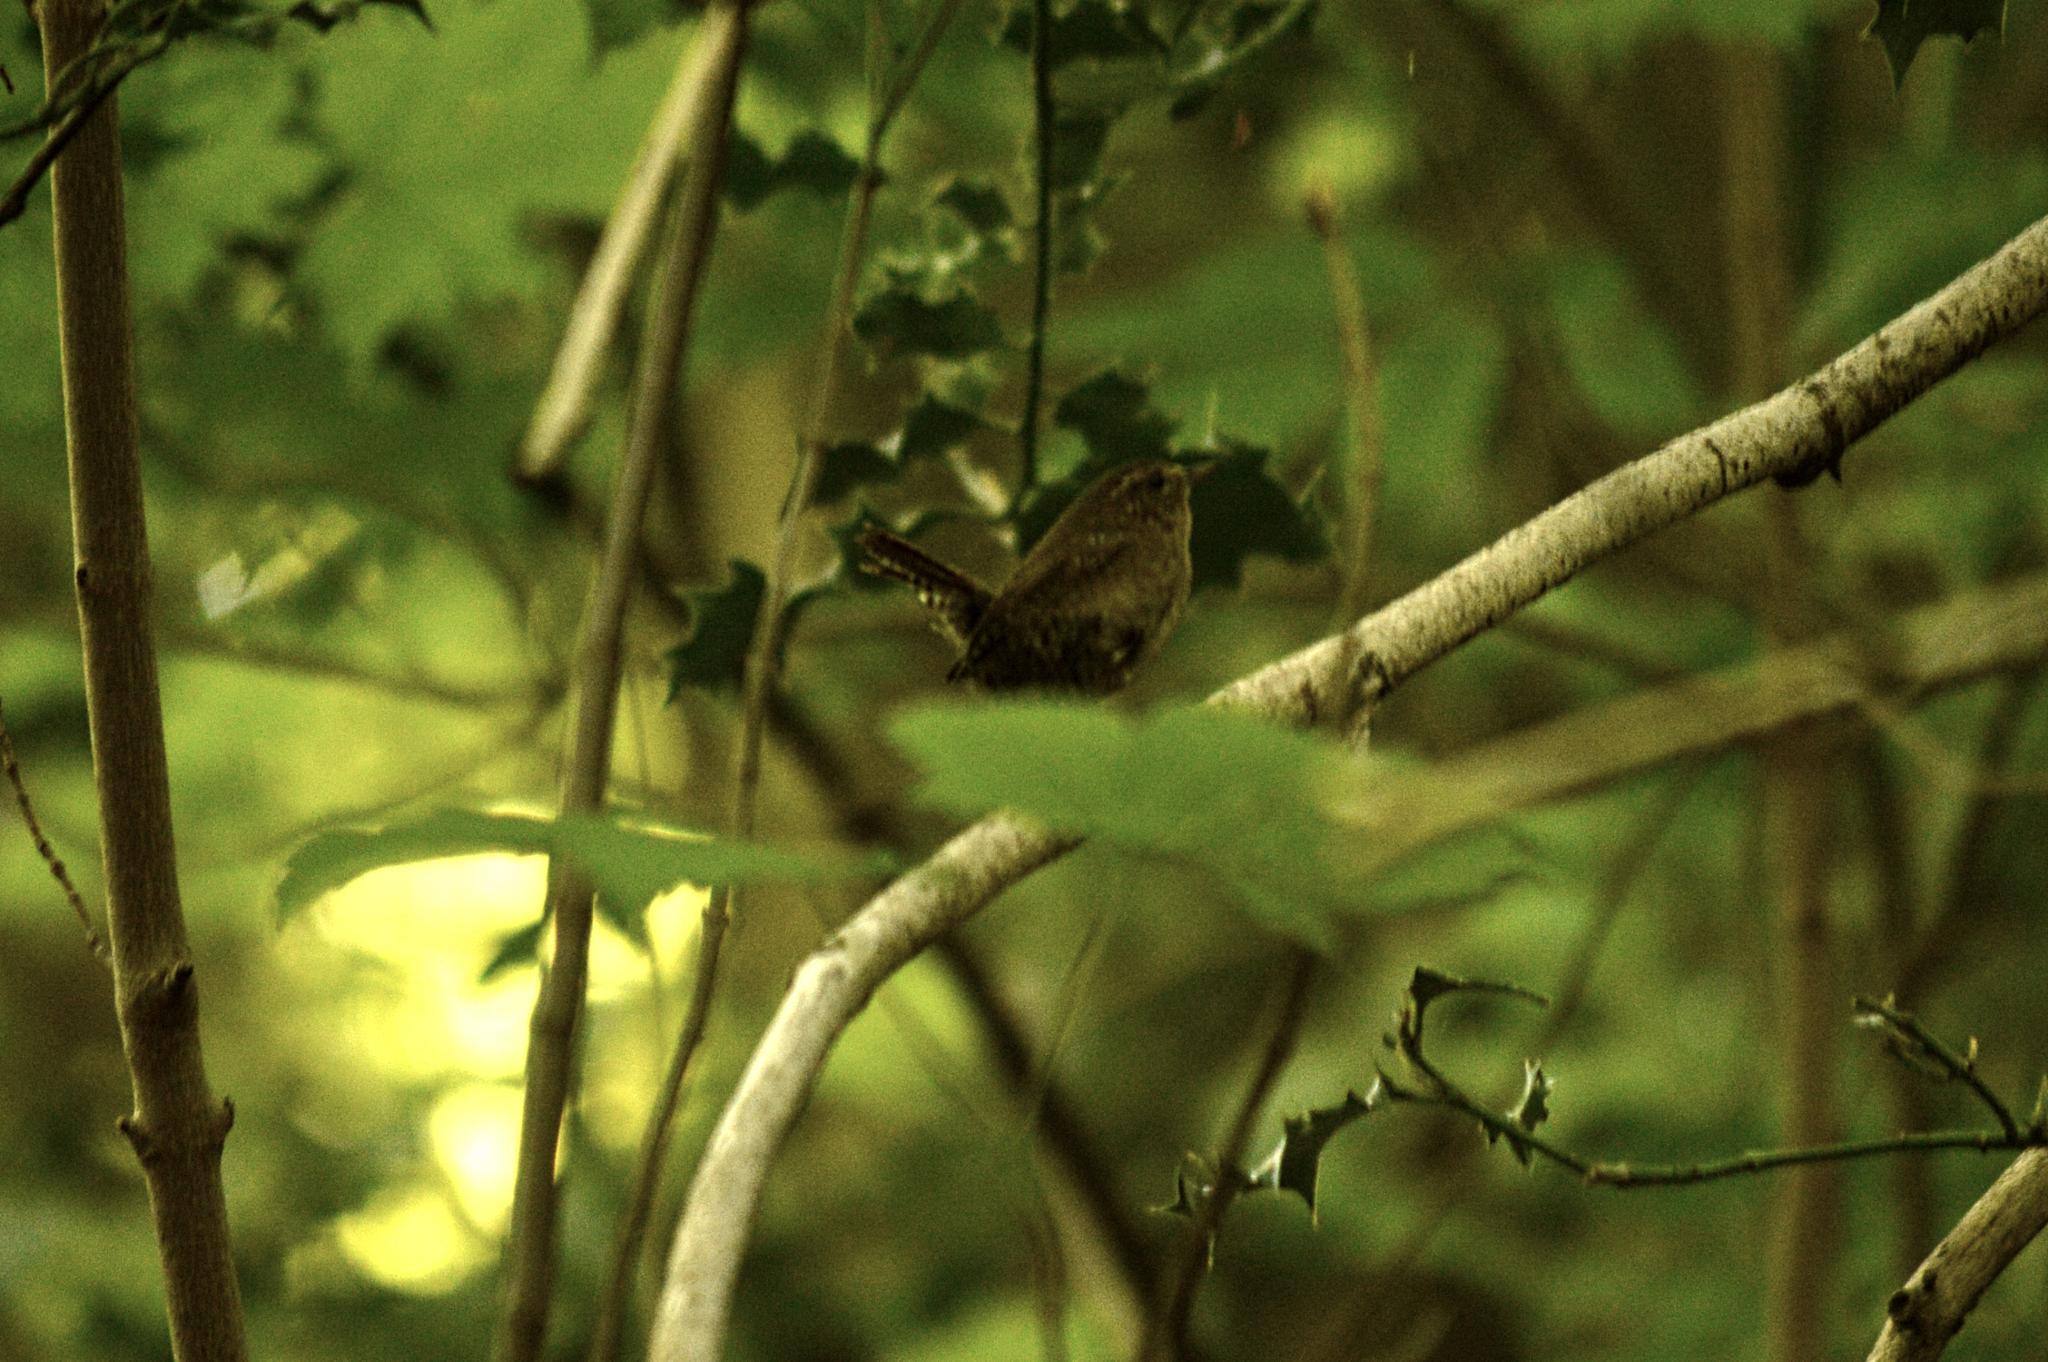 Songbird At Rupert Ravine by David Brian Paley